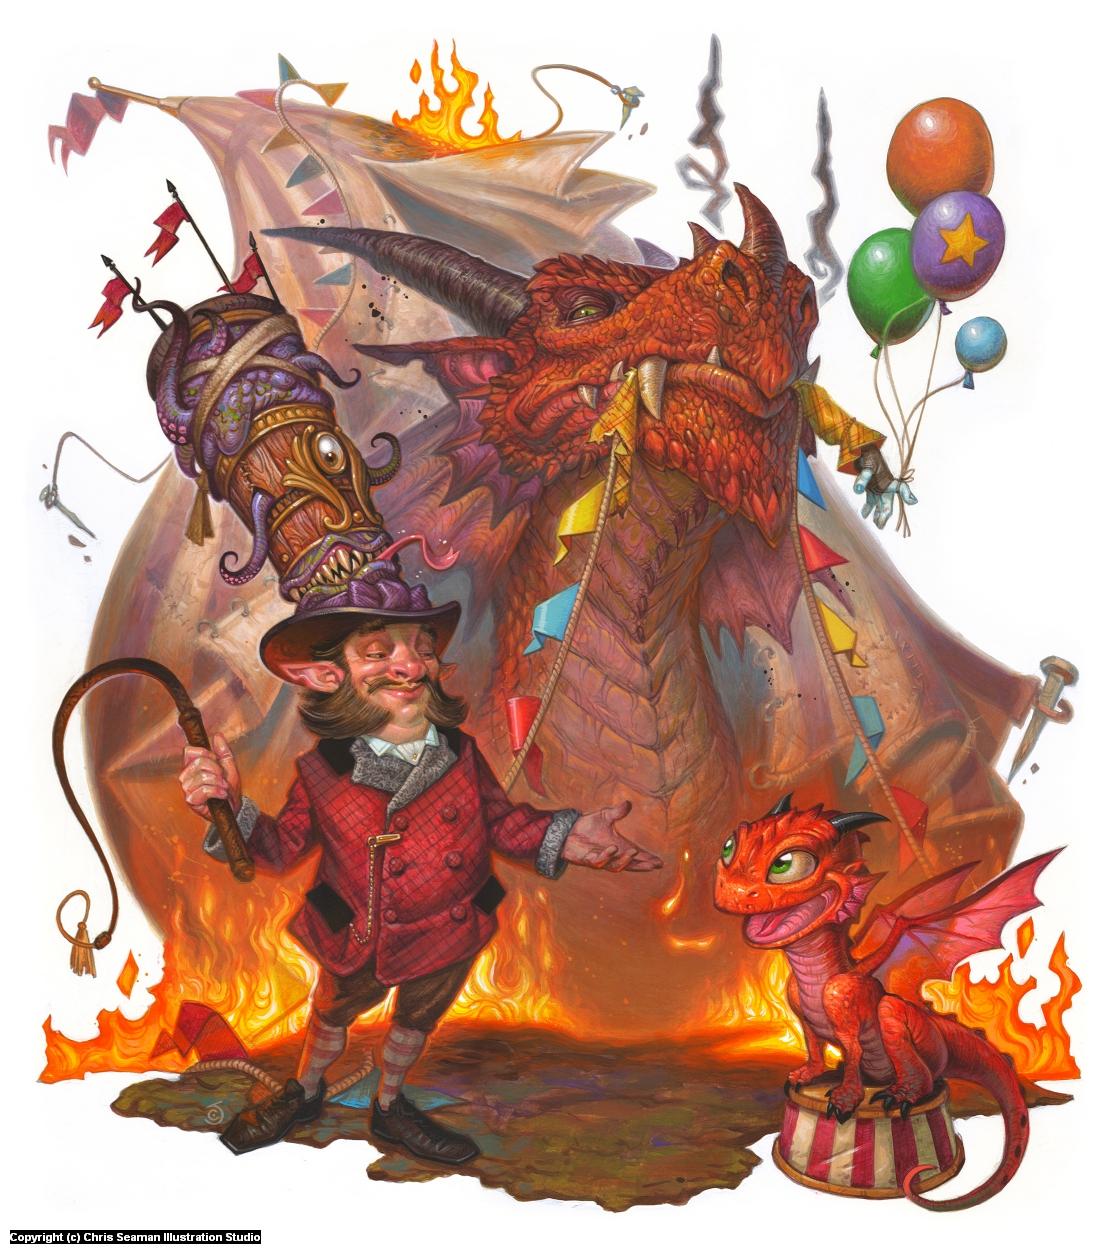 Dragon Circus Artwork by Chris Seaman